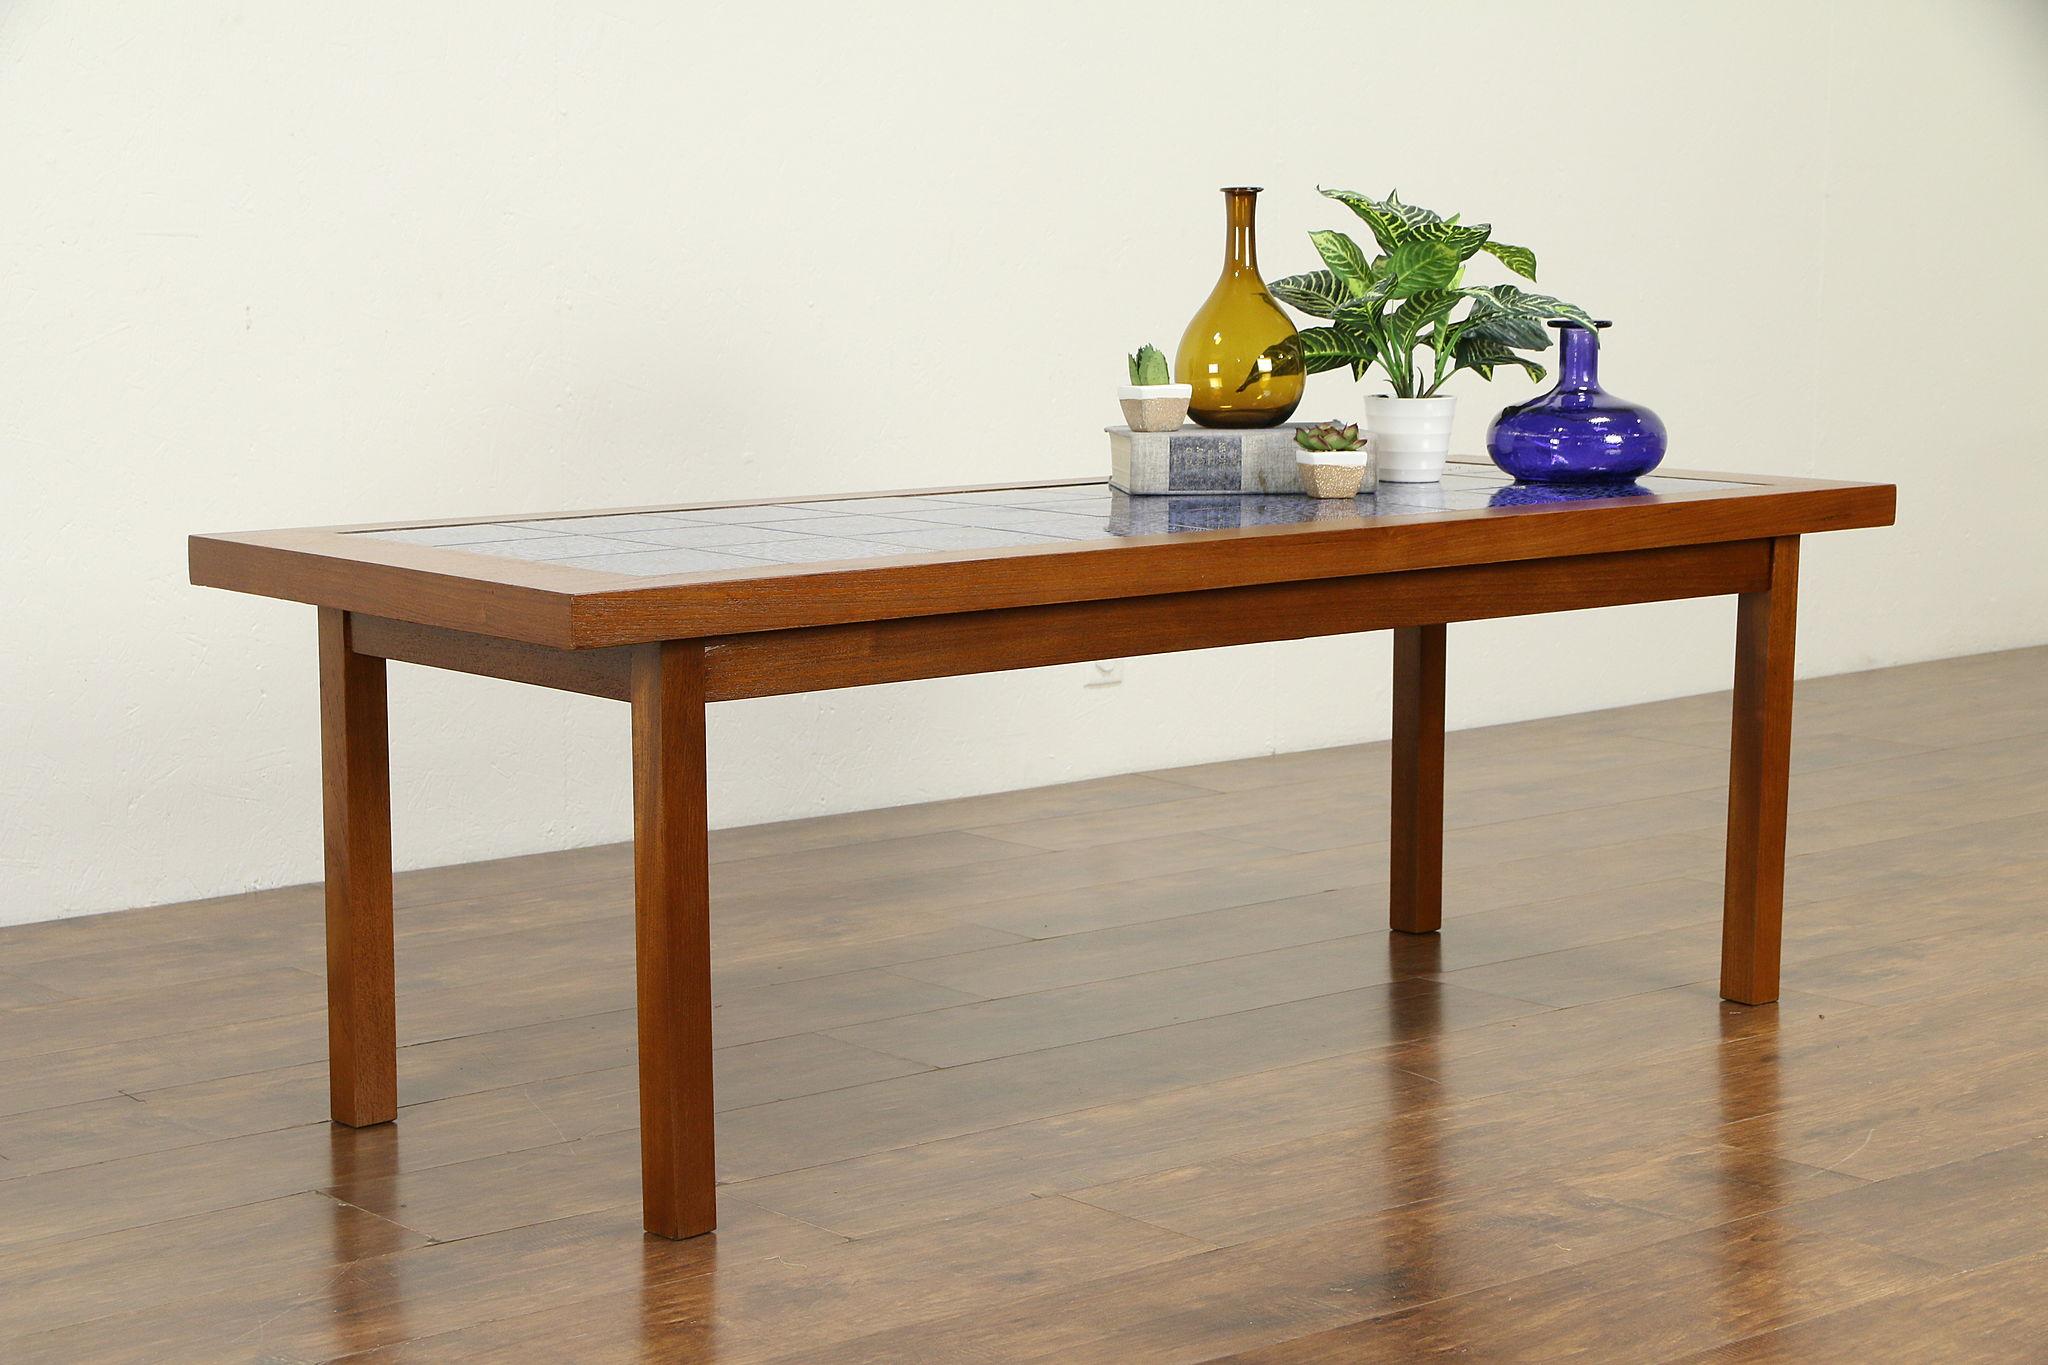 Sold Midcentury Modern 1960 Vintage Danish Teak Coffee Table Ceramic Tiles 32657 Harp Gallery Antiques Furniture